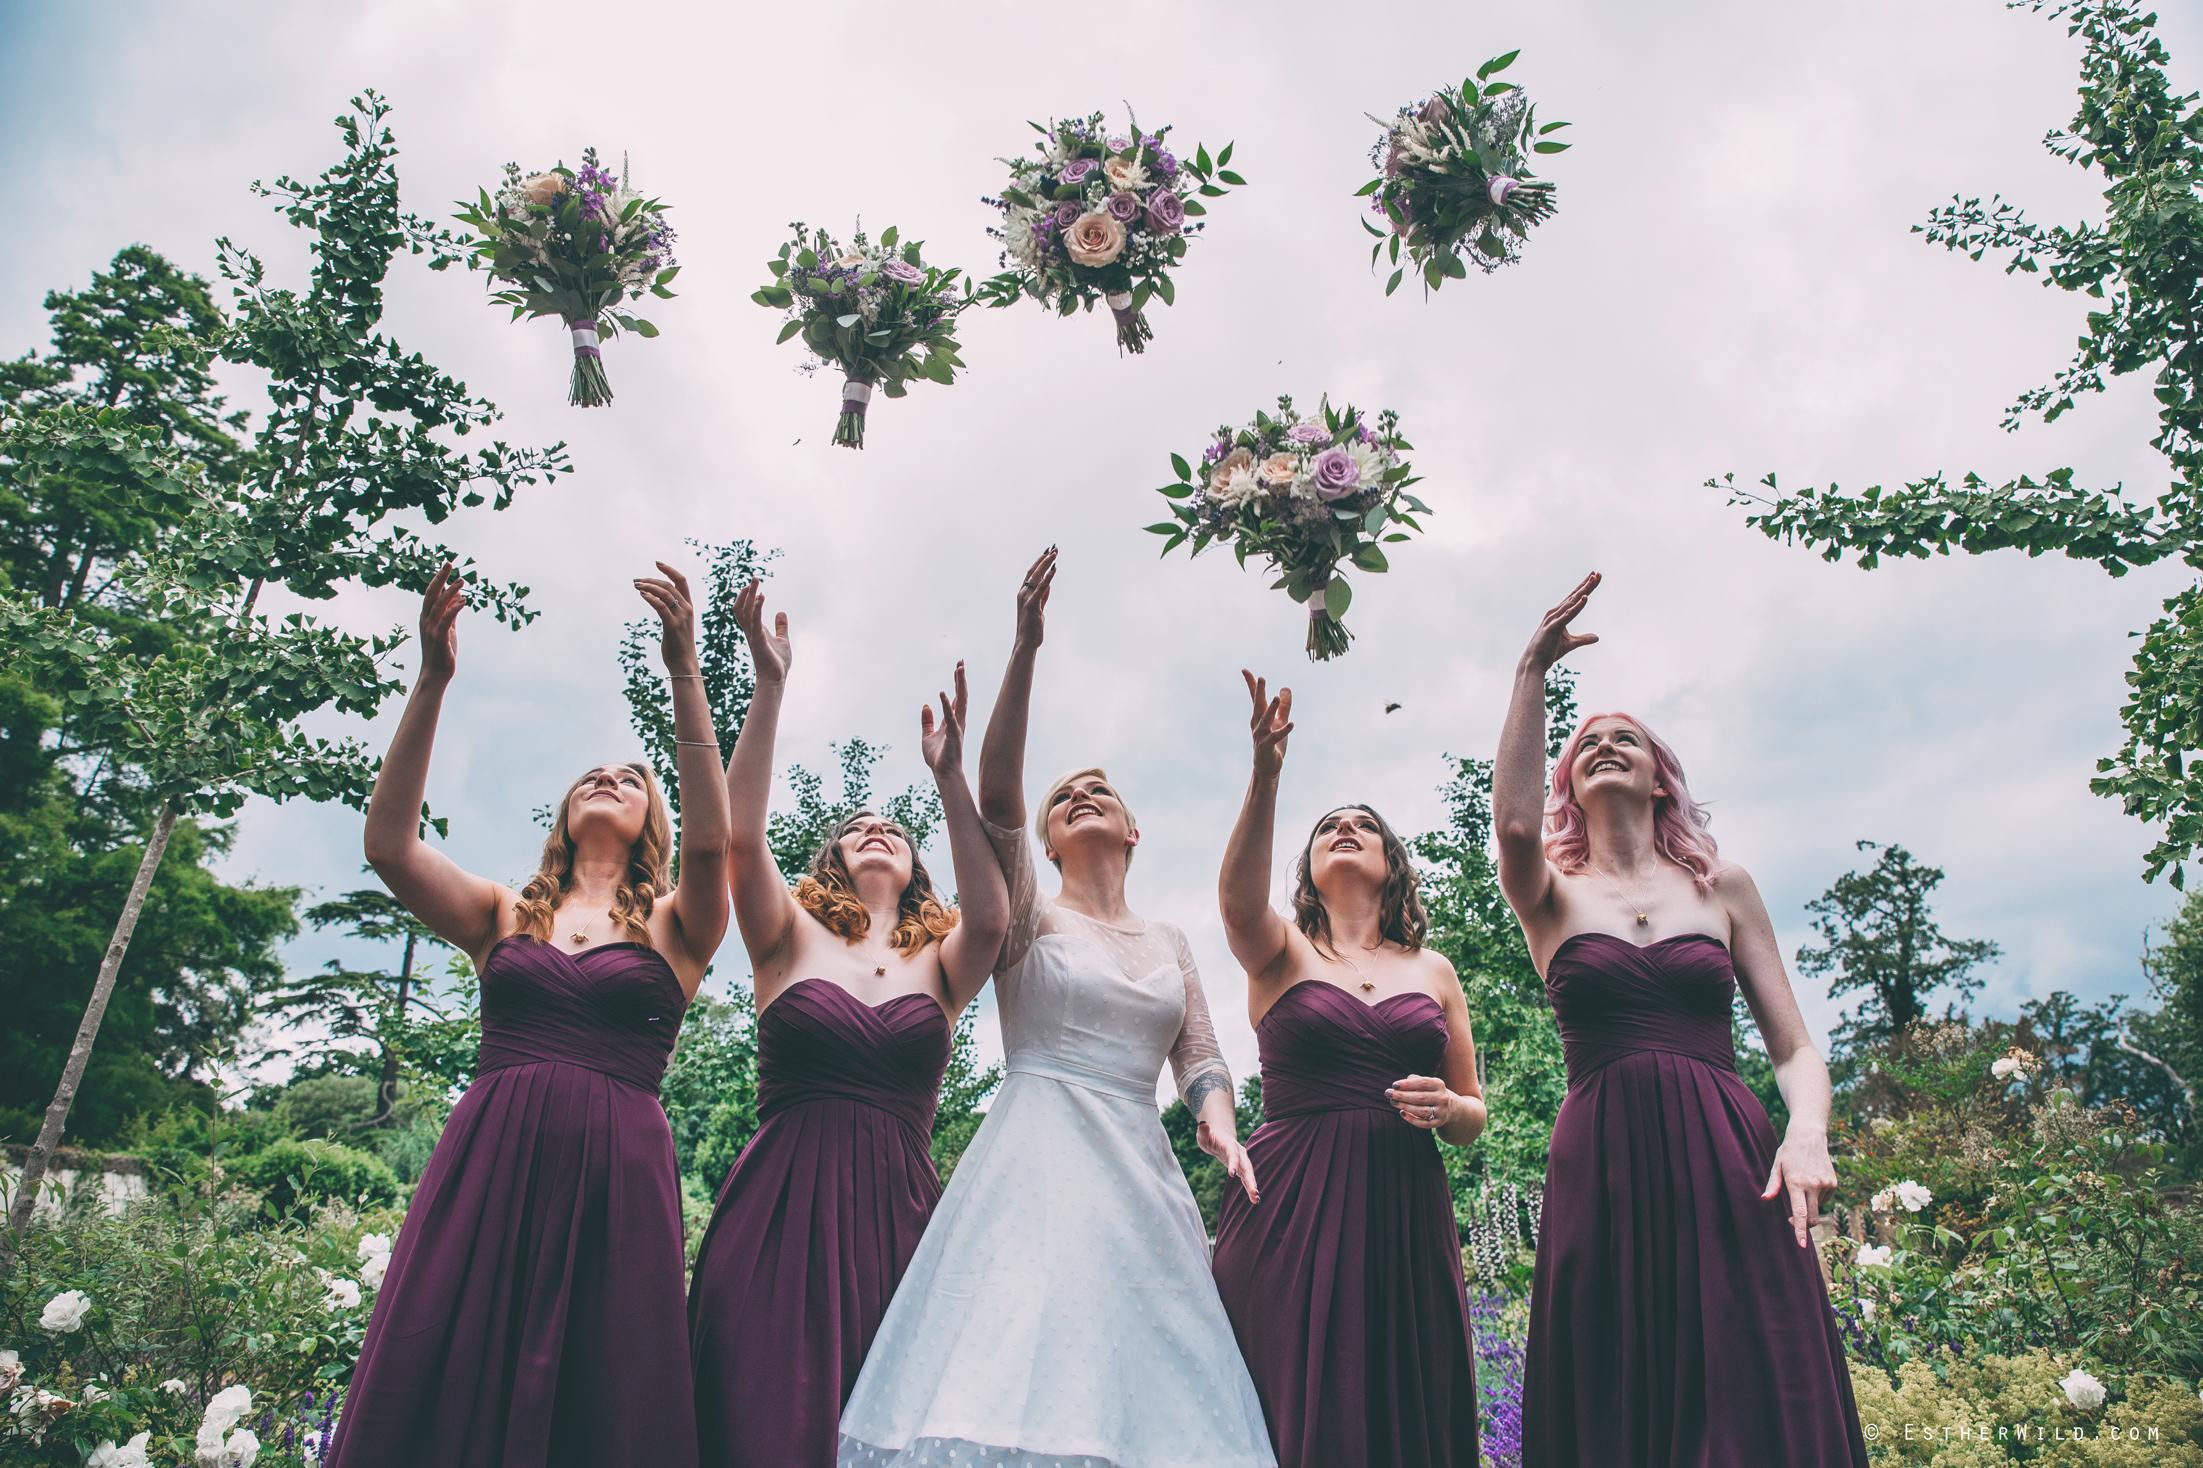 0617_London_Croydon_Clapham_Wedding_Photographer_Esther_Wild_Photography_IMG_5497.jpg